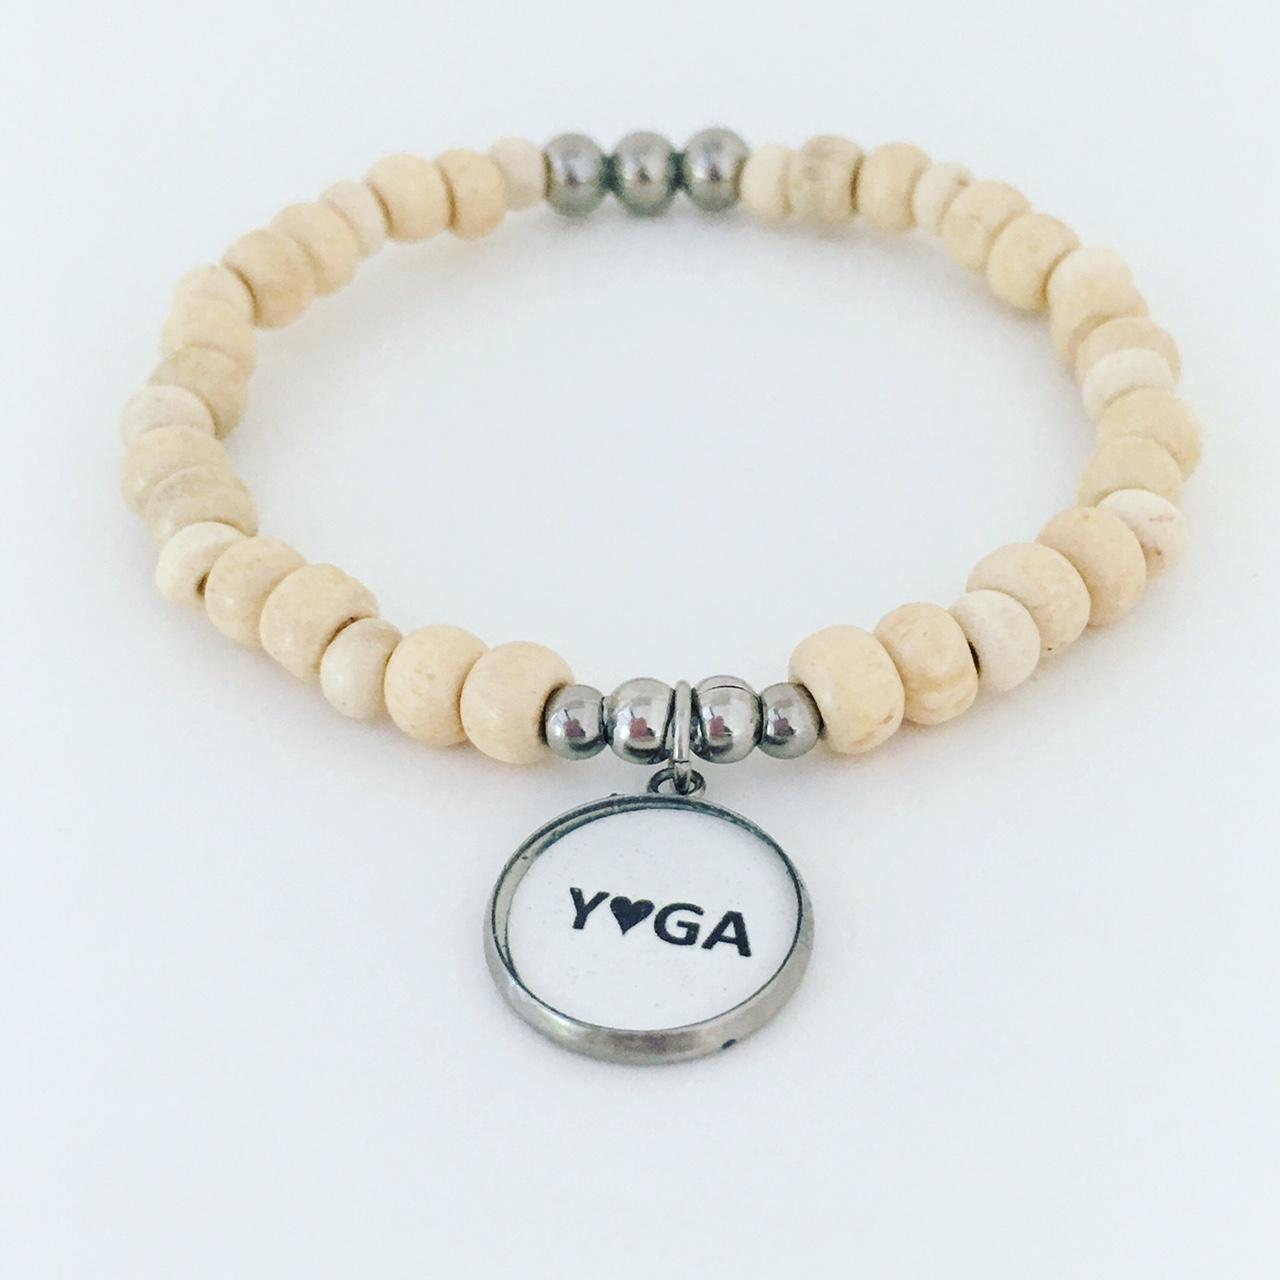 YOGA_yoga_5